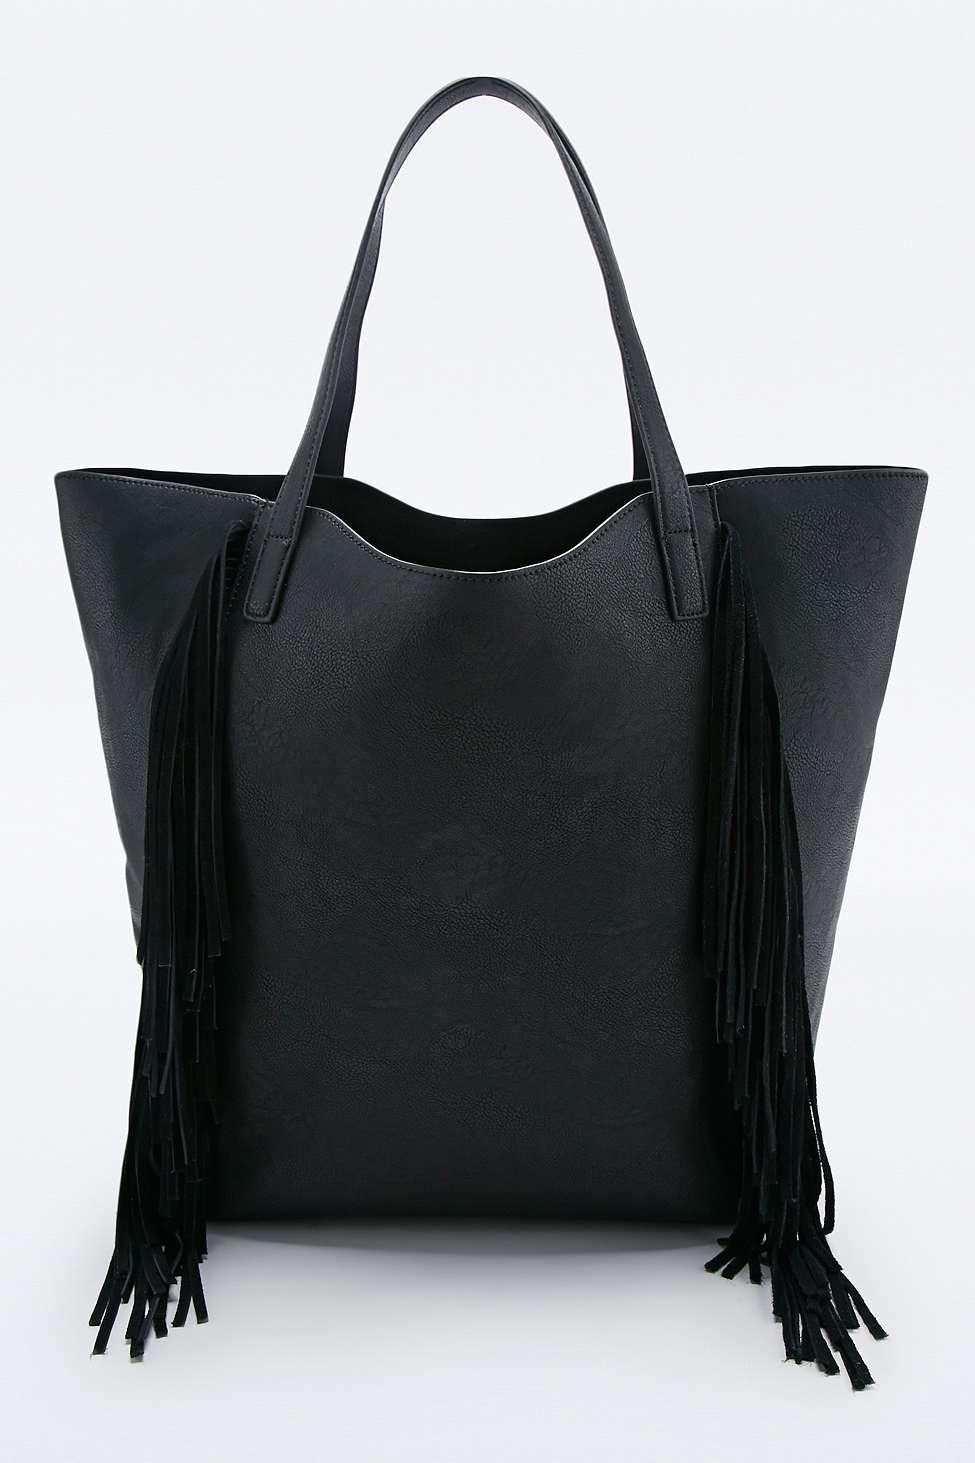 Tassen Urban Outfitters : De leukste tassen met een mooi prijsje ladify